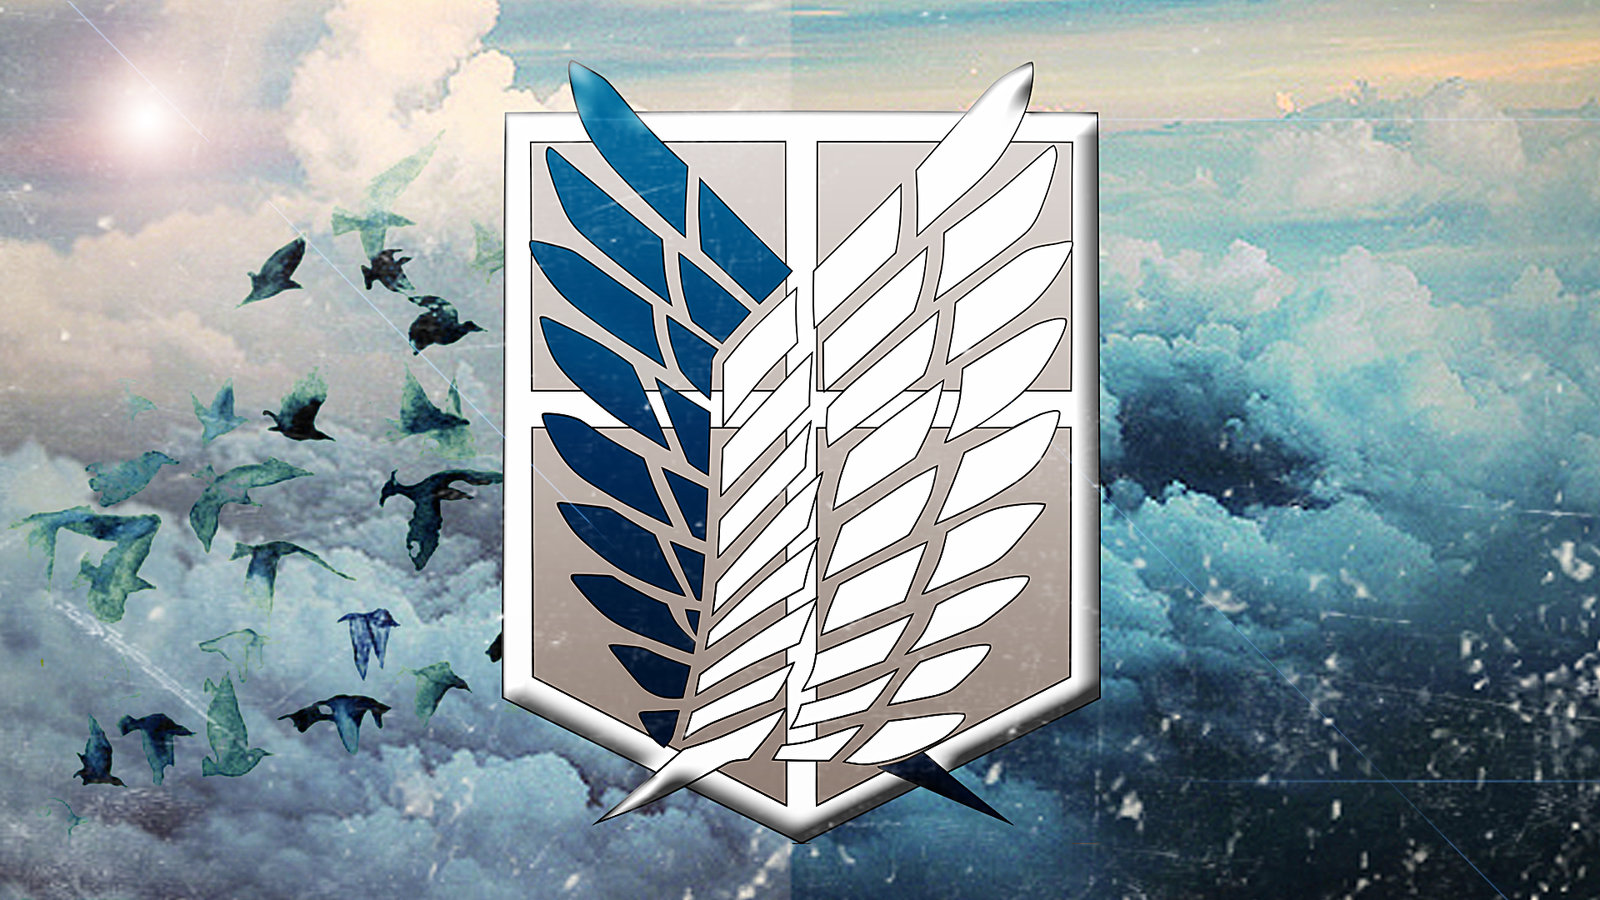 45 Wings Of Freedom Wallpapers On Wallpapersafari